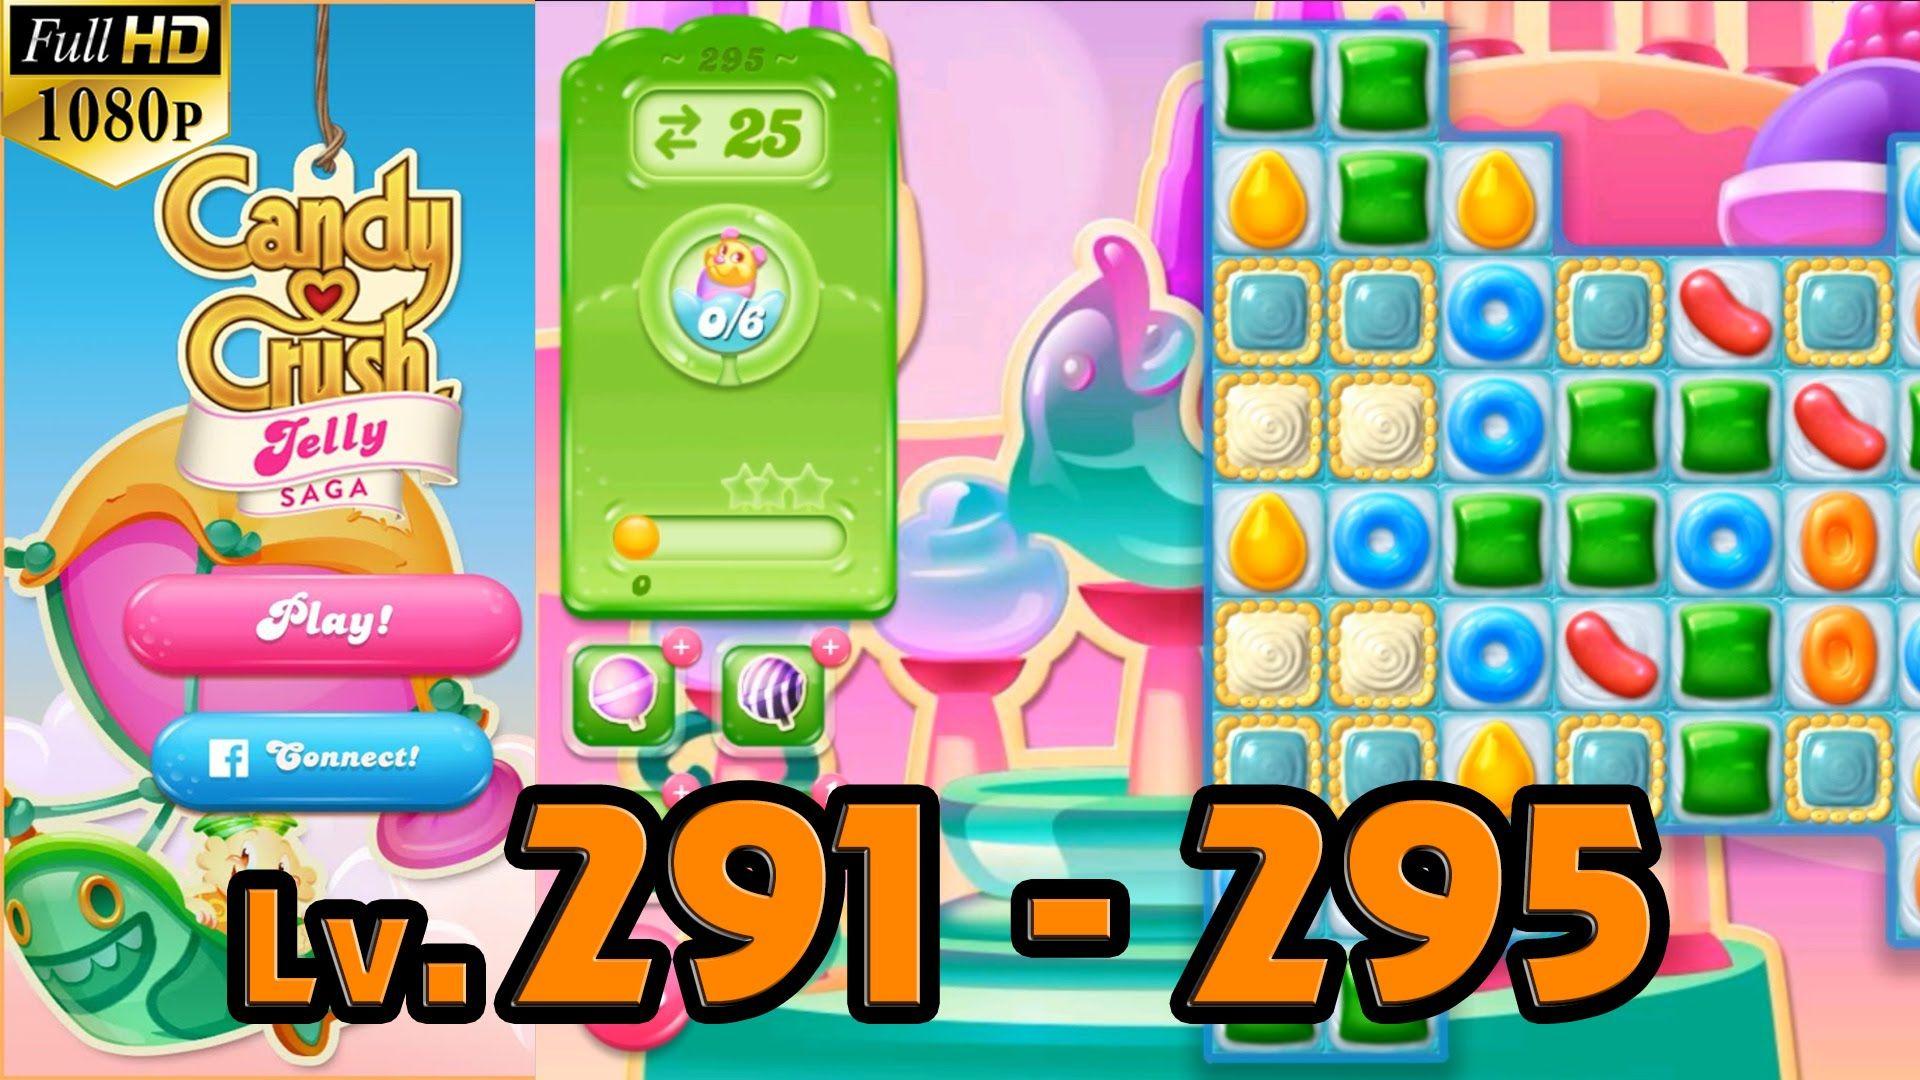 Candy Crush Jelly Saga Level 291 295 (1080p/60fps)